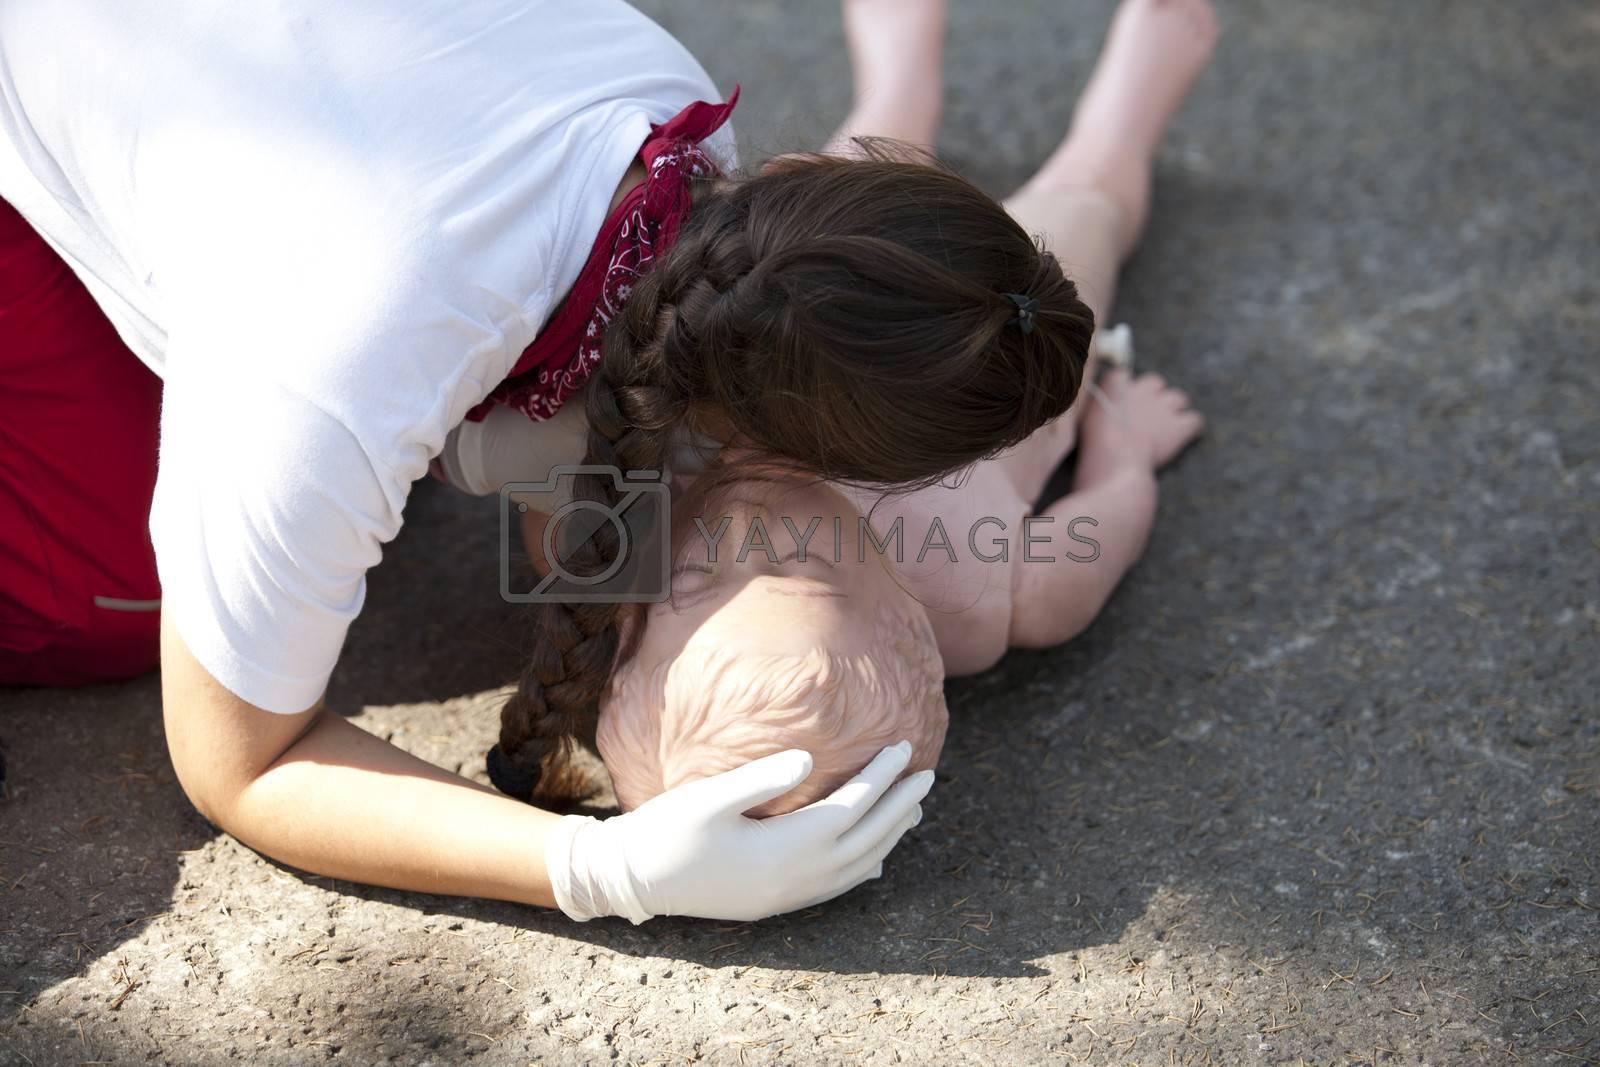 CPR practitioner examining airways on dummy